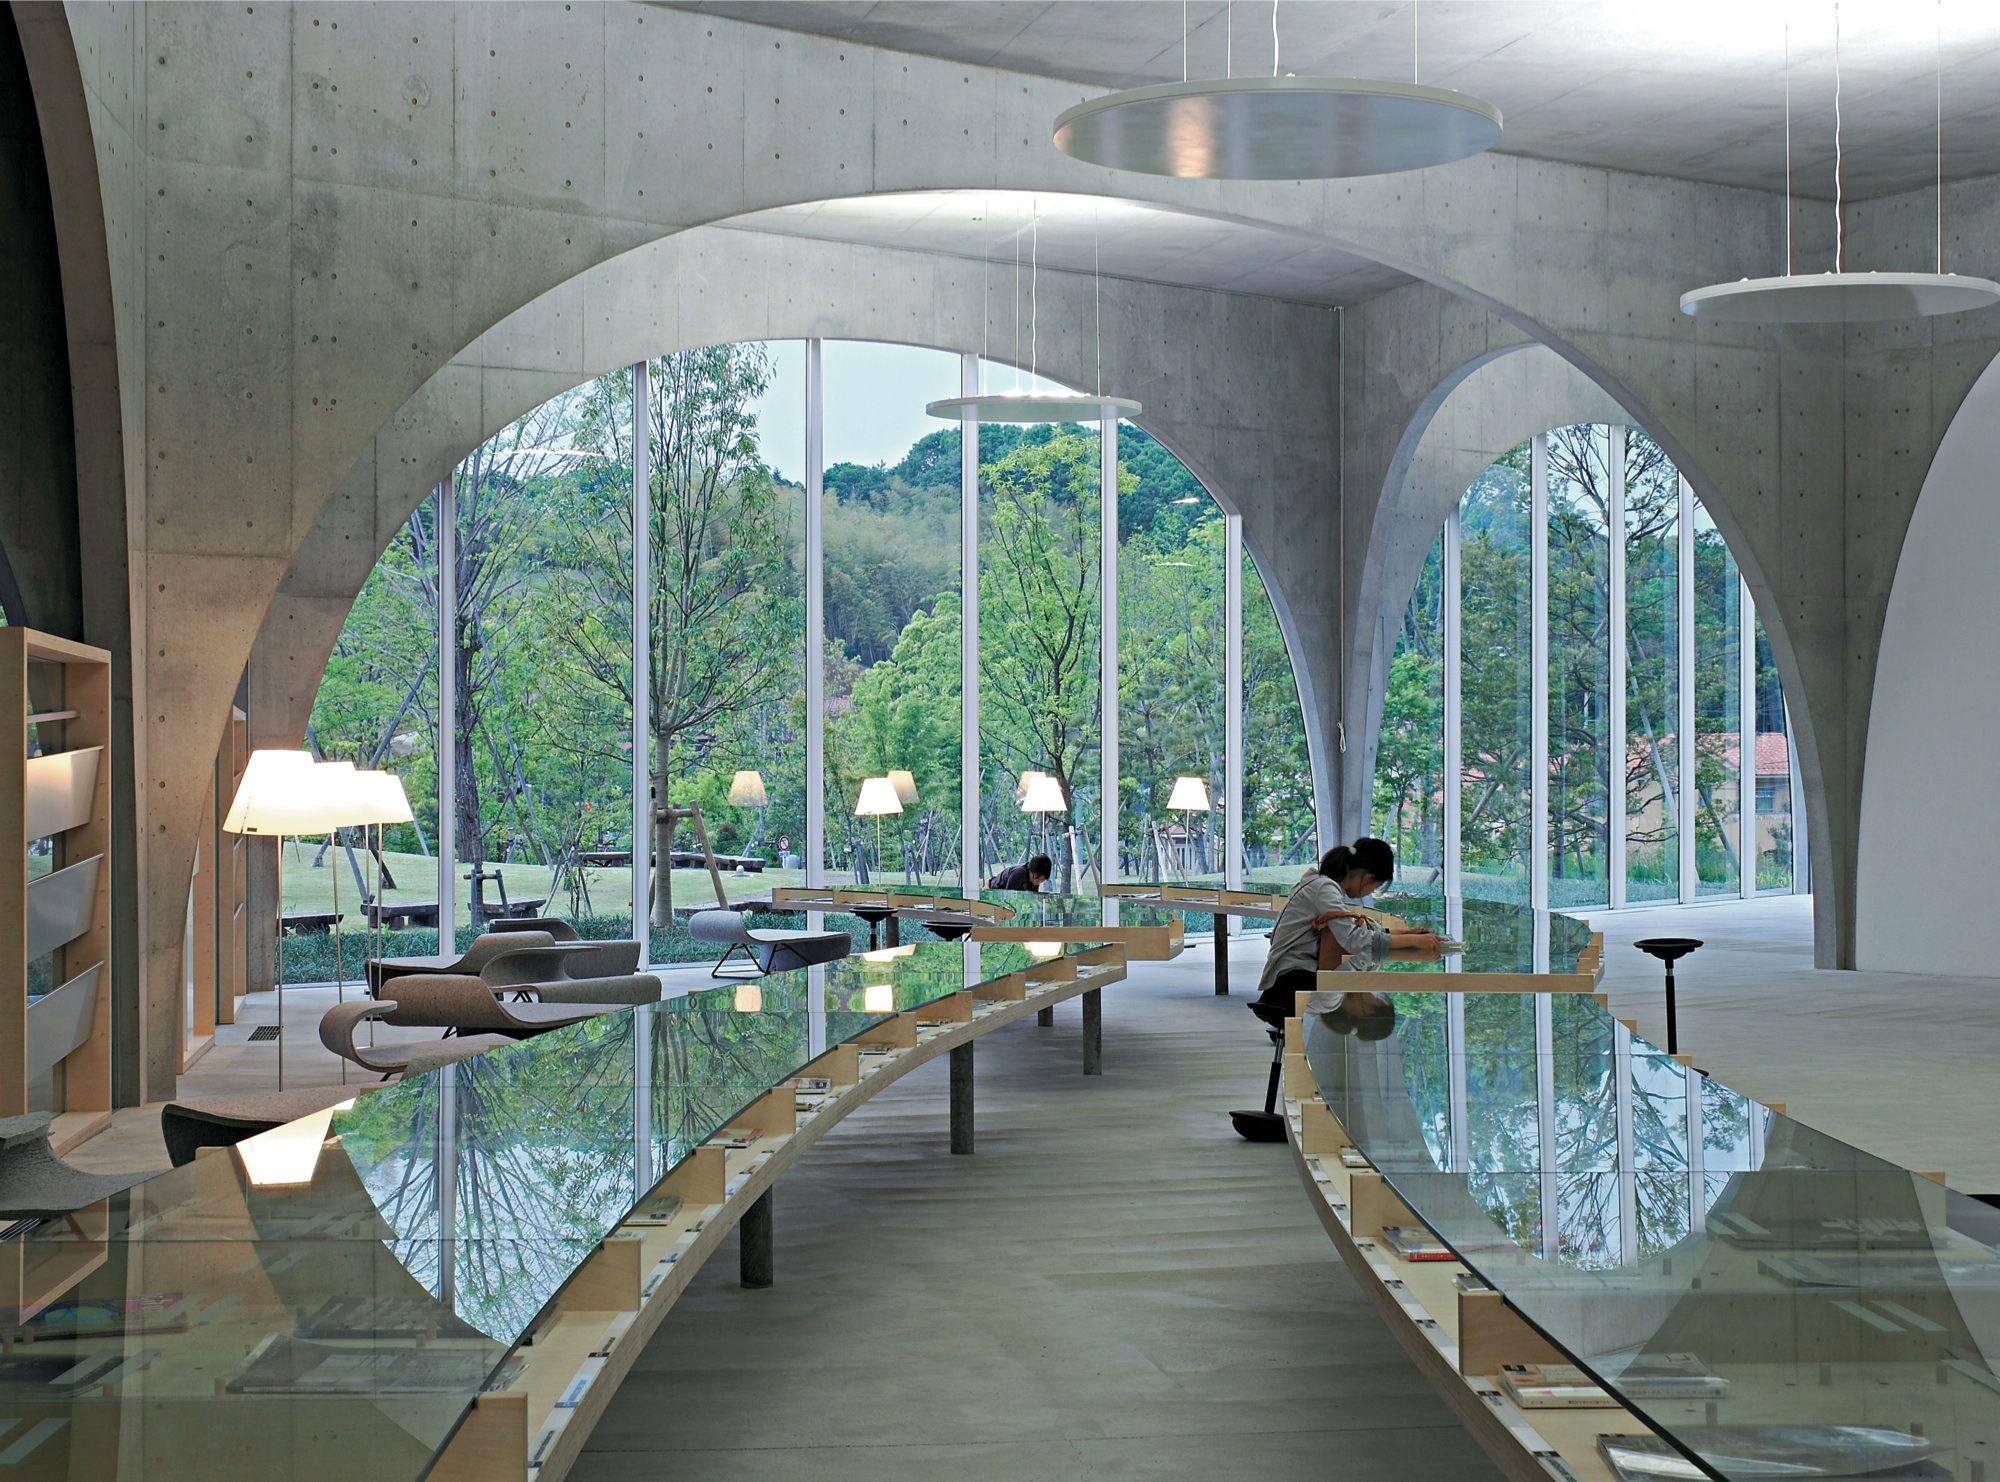 Tama Art University Library Design Ideas 9 On Tokyo JapanArchitecture Interior